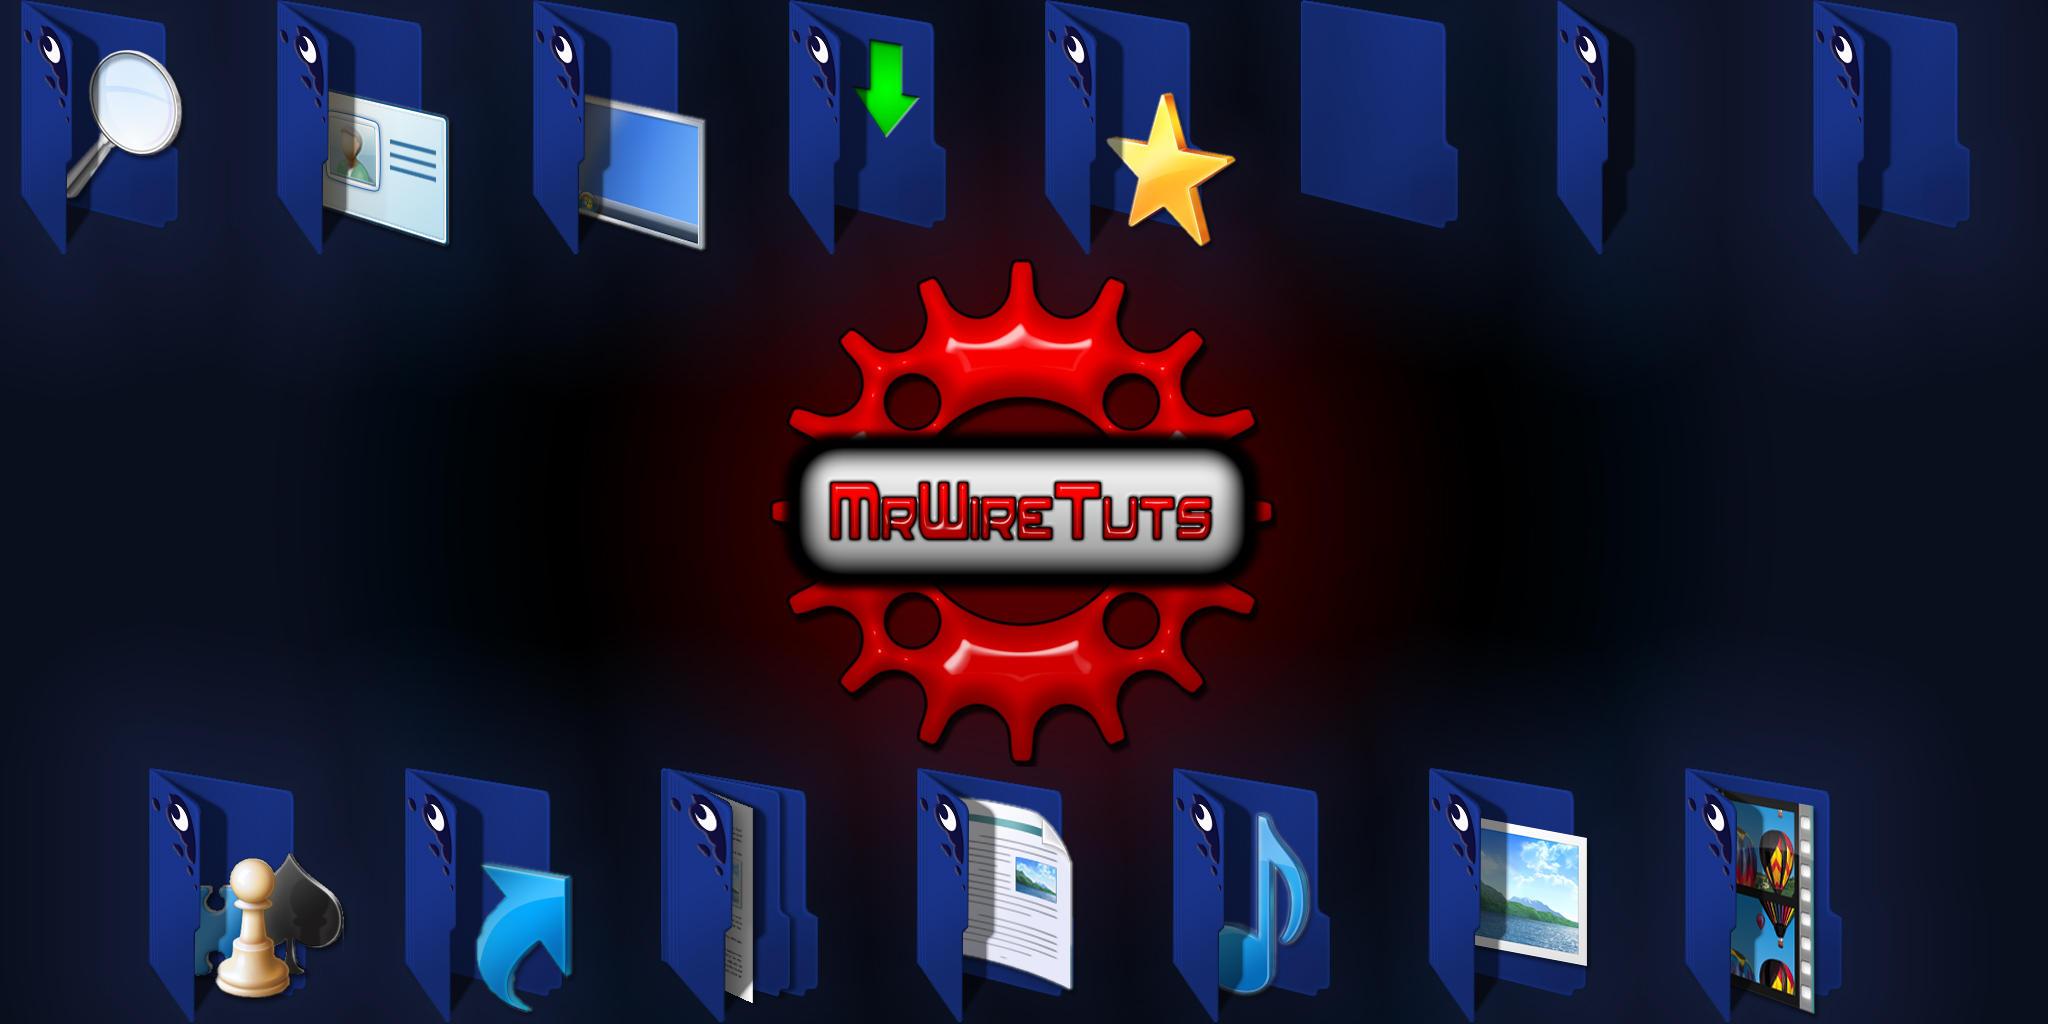 Princess Luna Folder Icons Pack by MrWireTuts